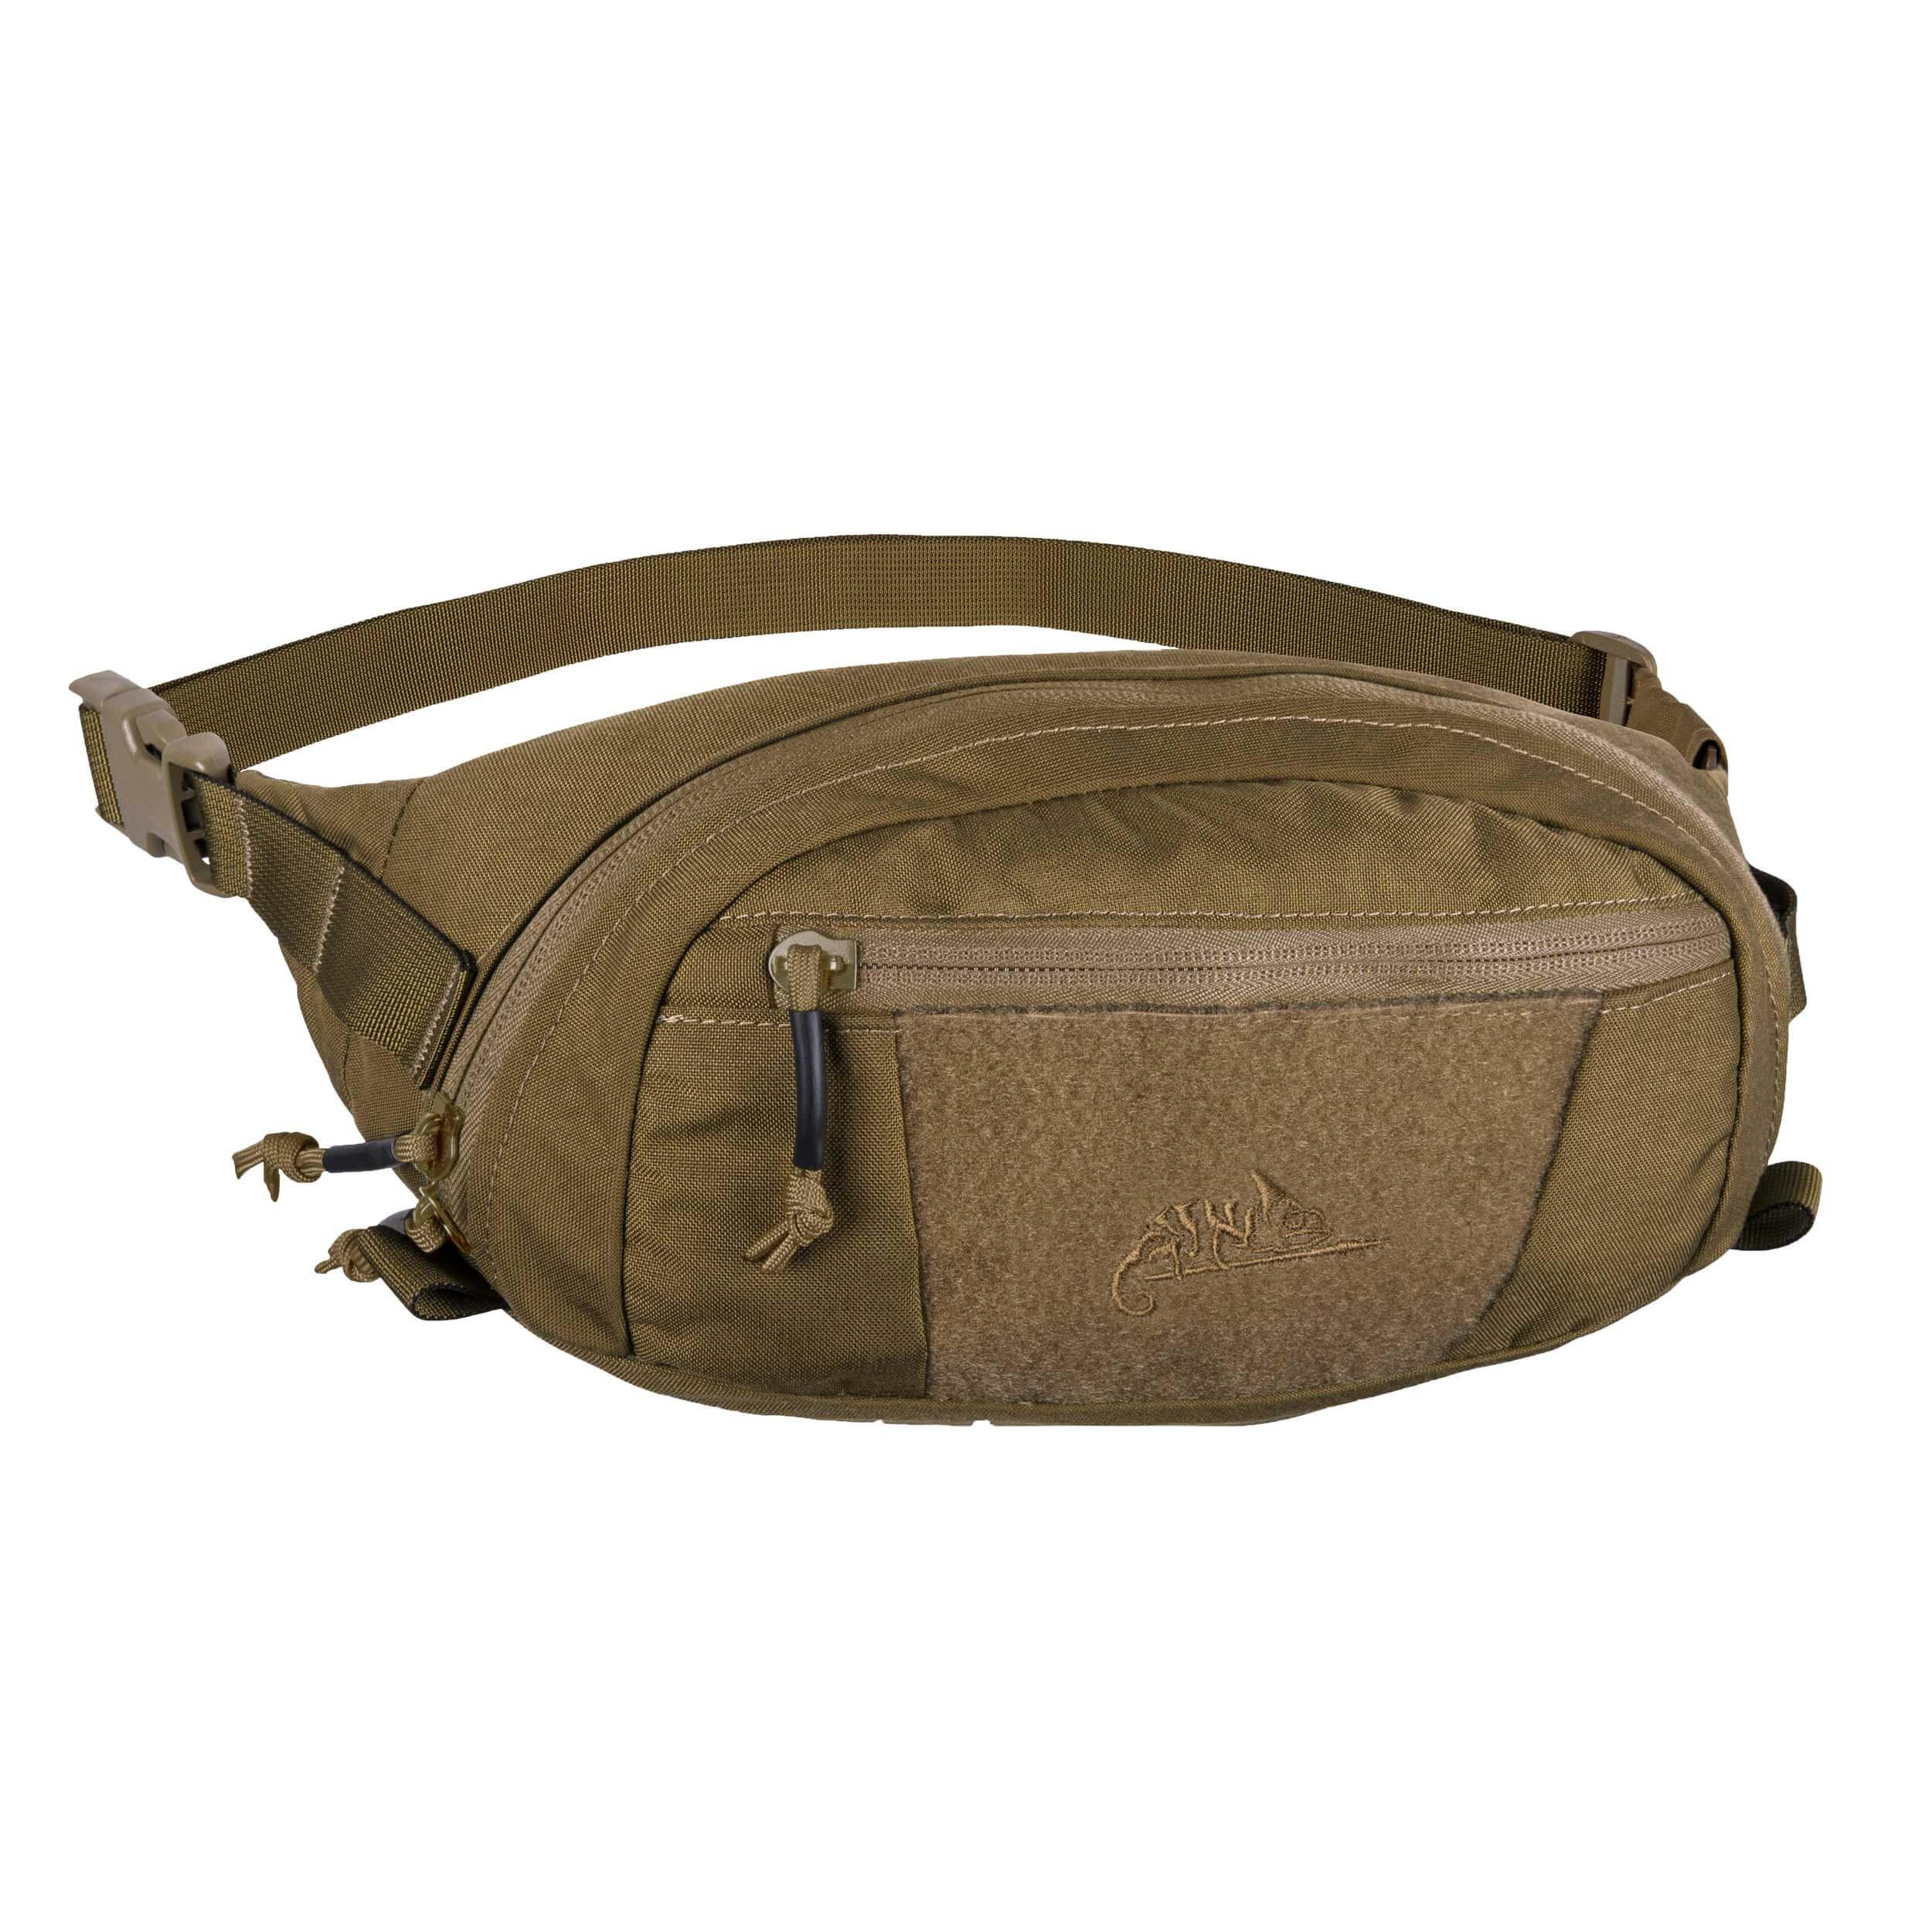 Helikon-Tex Waist Pack Bandicoot Coyote